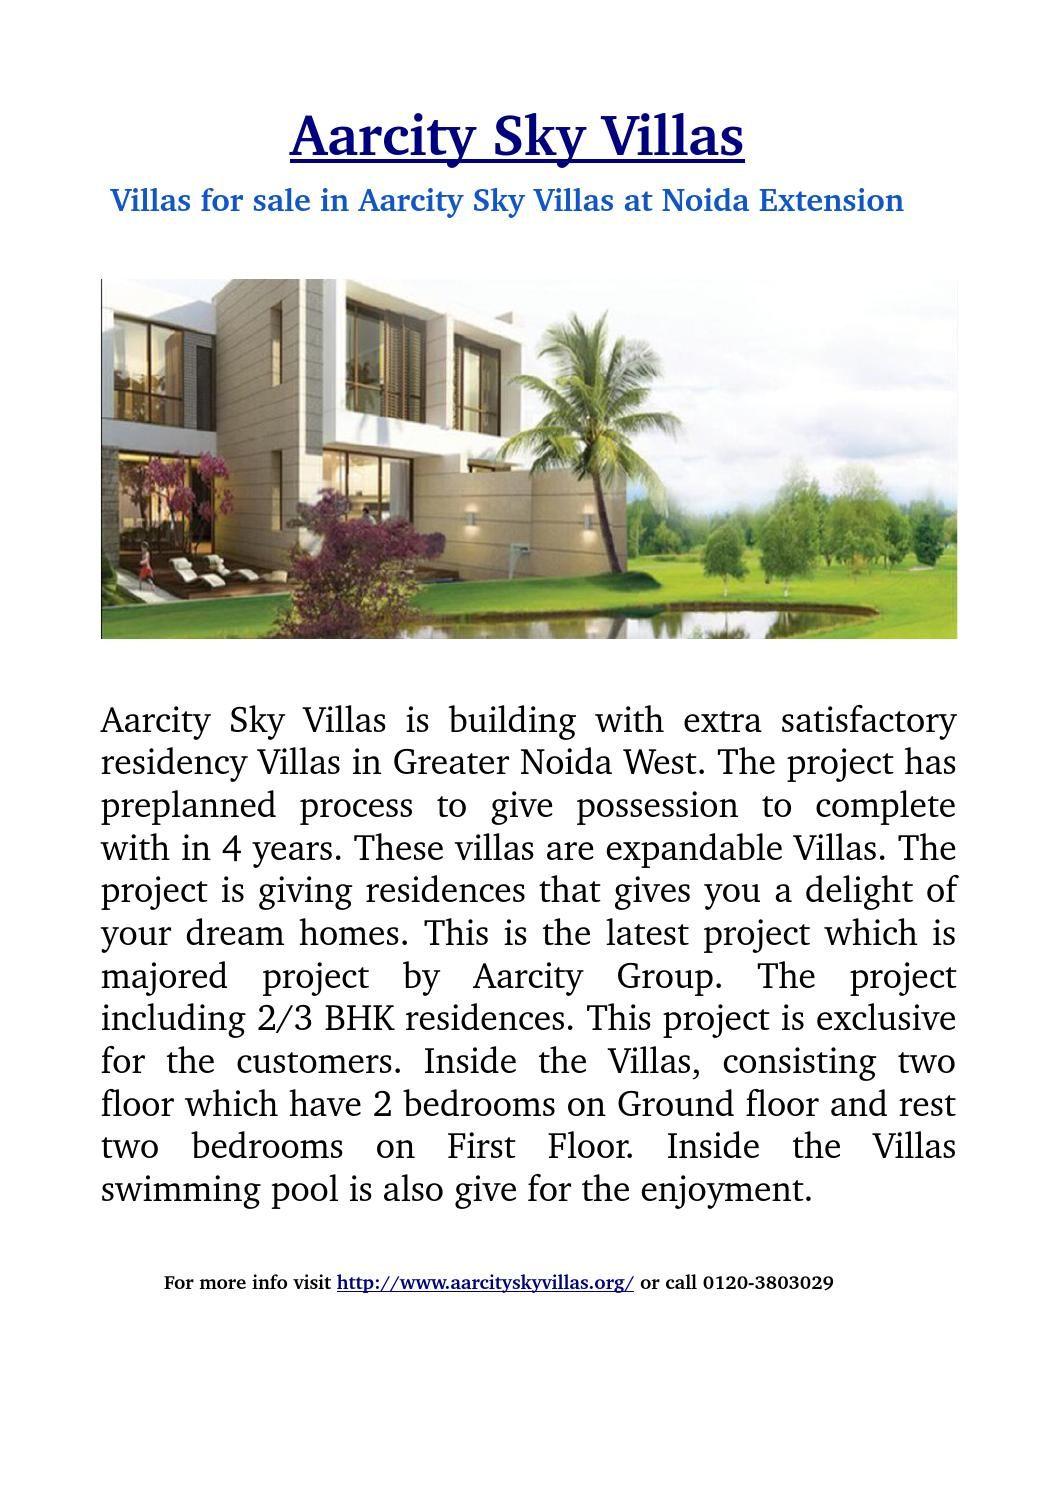 Villas For Sale In Aarcity Sky Villas At Noida Extension With